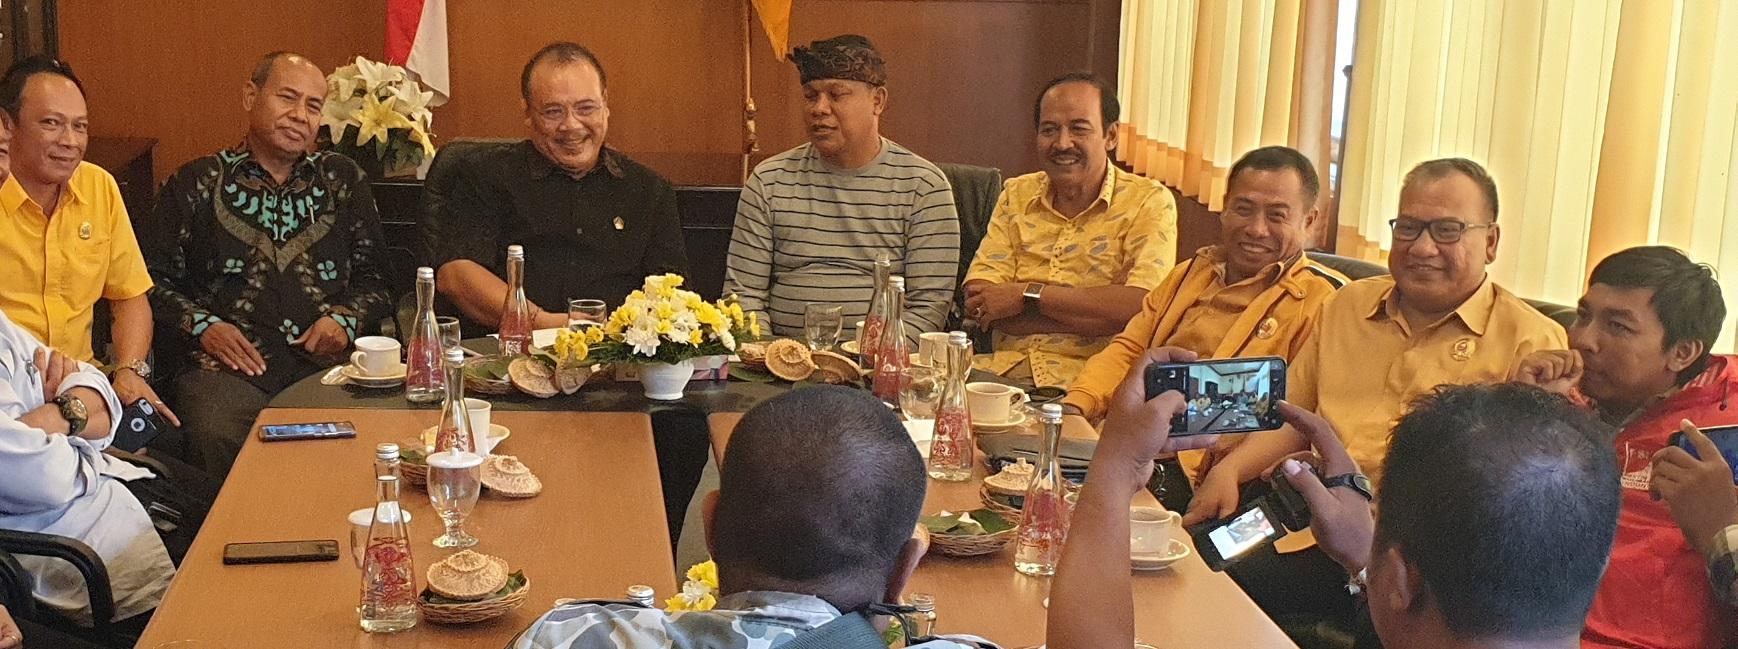 NYOMAN Sugawa Korry (tengah) bersama para pemimpin partai yang perolehan suaranya minor di parlemen daerah di Bali, saat berbincang di DPD Partai Golkar Bali membahas rencana koalisi bersama menantang PDIP dalam Pilkada Serentak 2020. Meski belum ada kesepakatan resmi, kemungkinan koalisi gemuk ini akan terwujud dalam waktu dekat. Foto: gus hendra